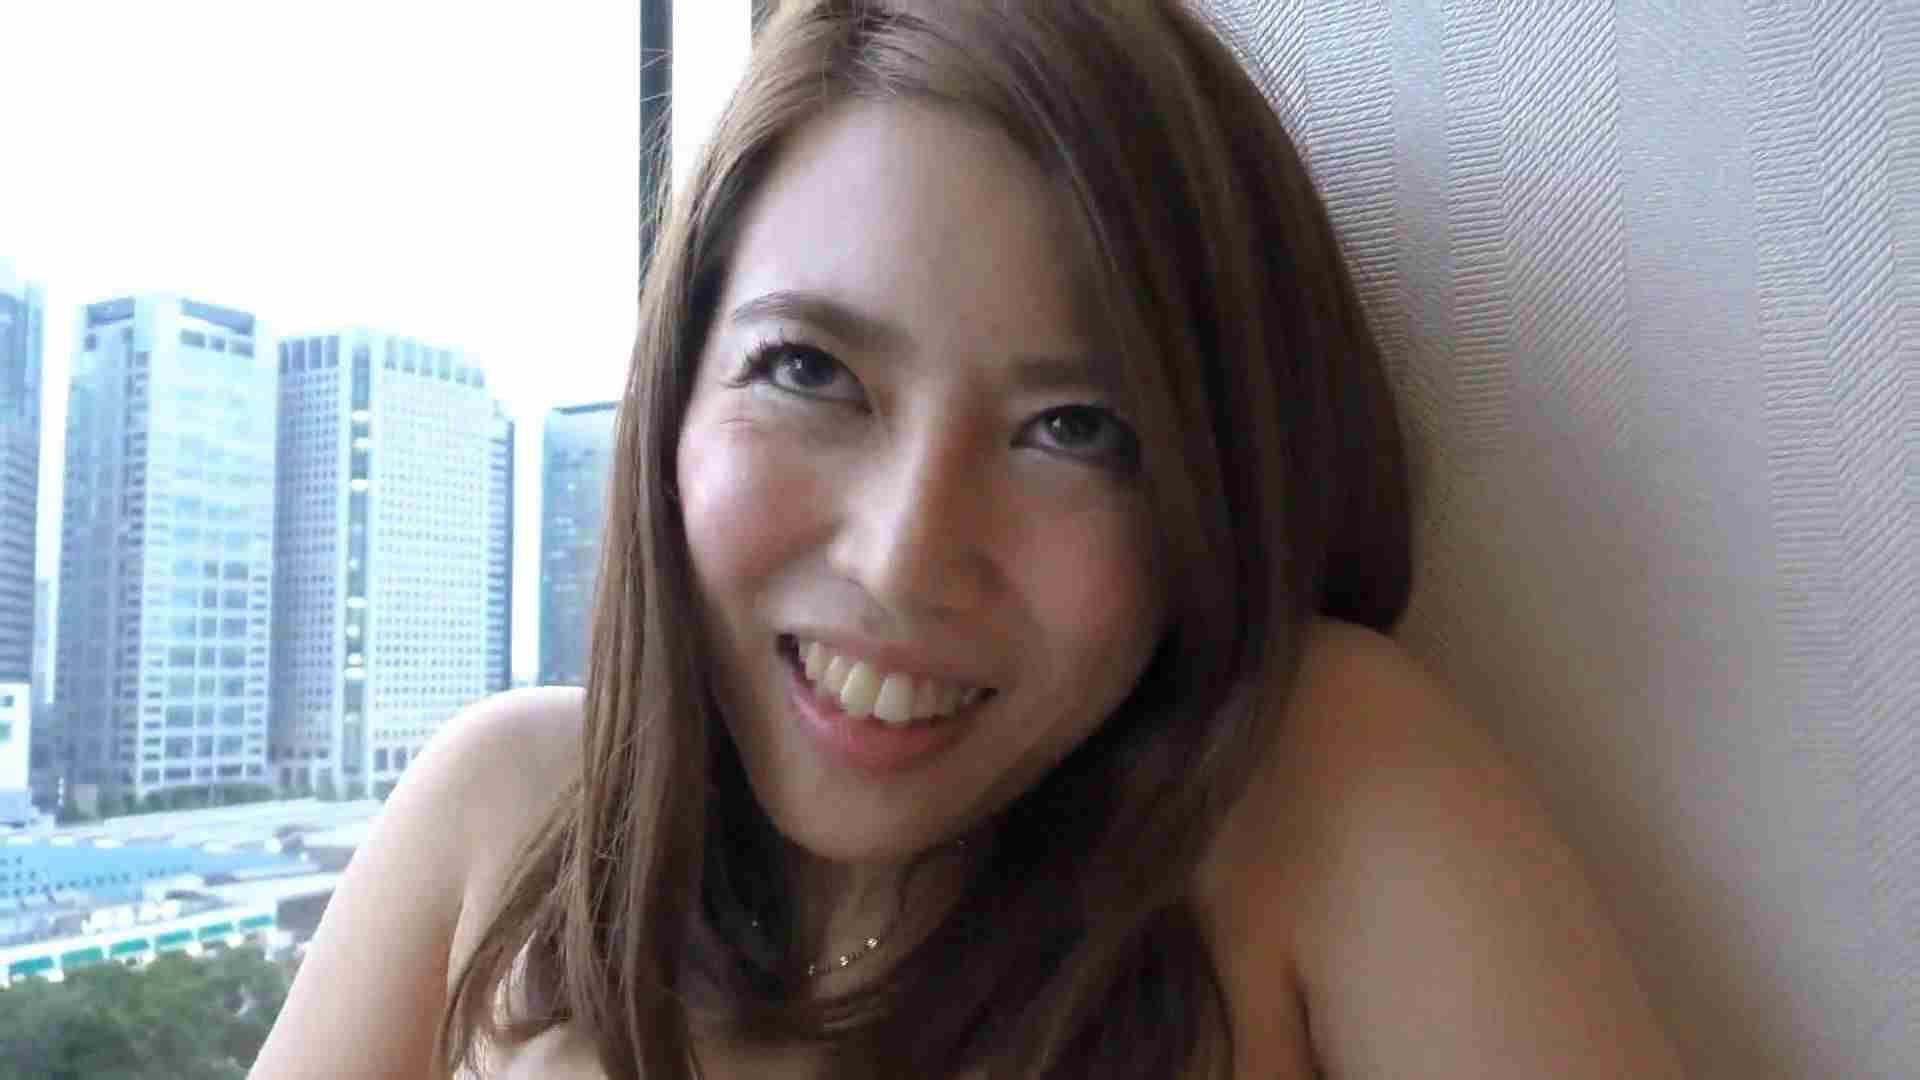 S級厳選美女ビッチガールVol.21 OLヌード天国   モデルのエッチ  60PIX 16